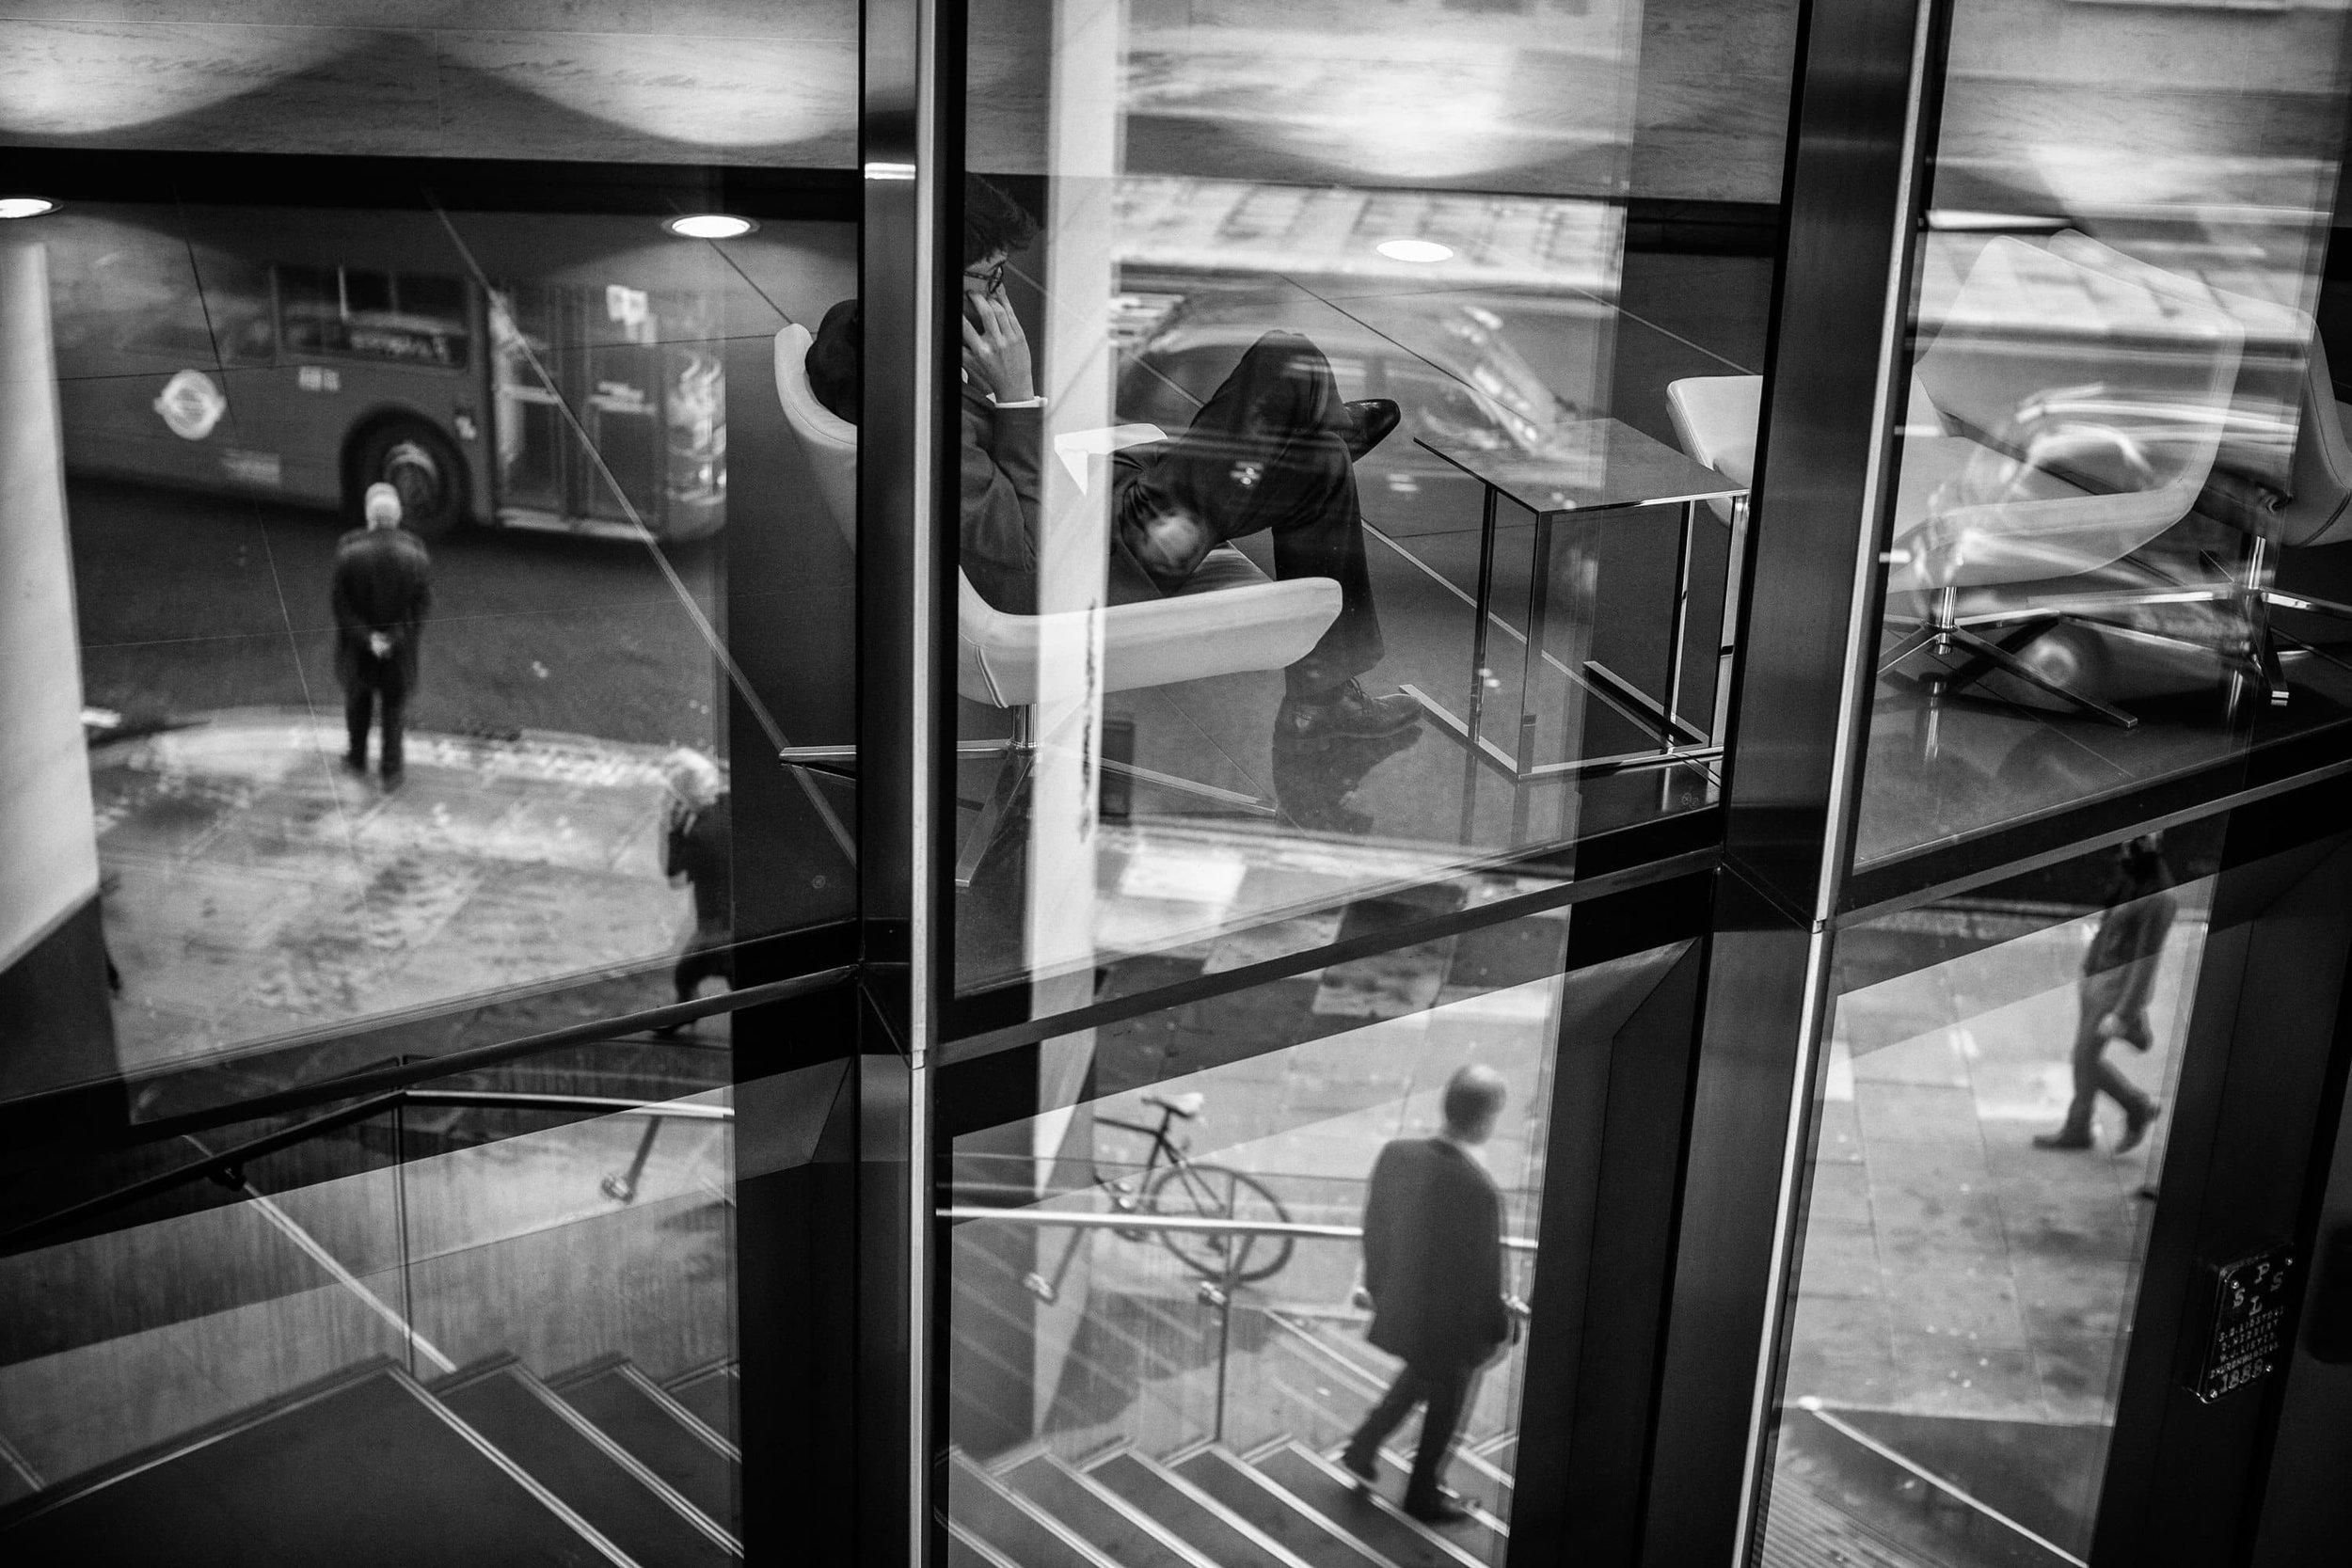 street-documentary-photography-fabio-burrelli-22.jpg